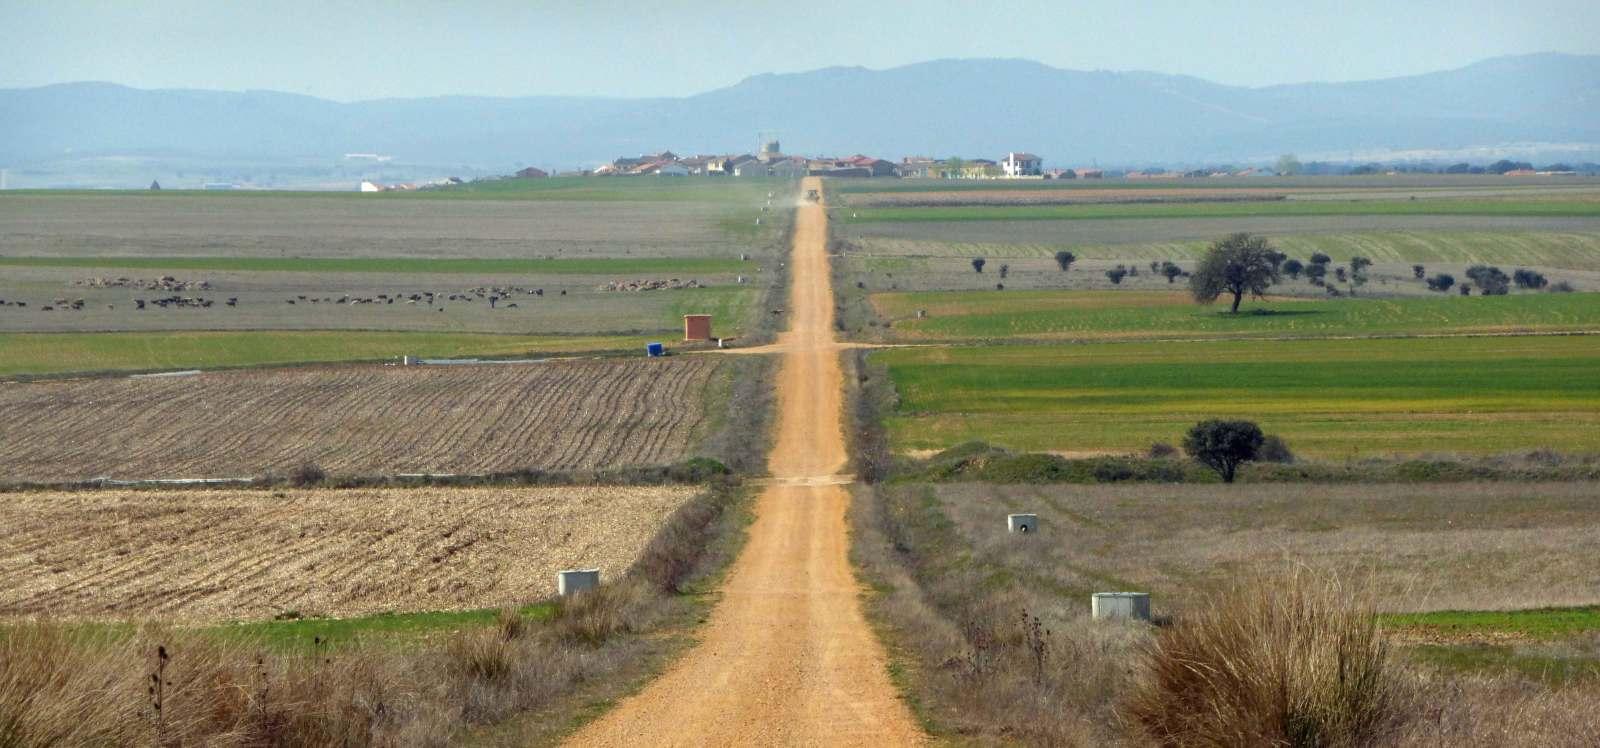 plata - Vía de la Plata-Camino Sanabrés (Sevilla-Santiago). - Página 2 110yij4